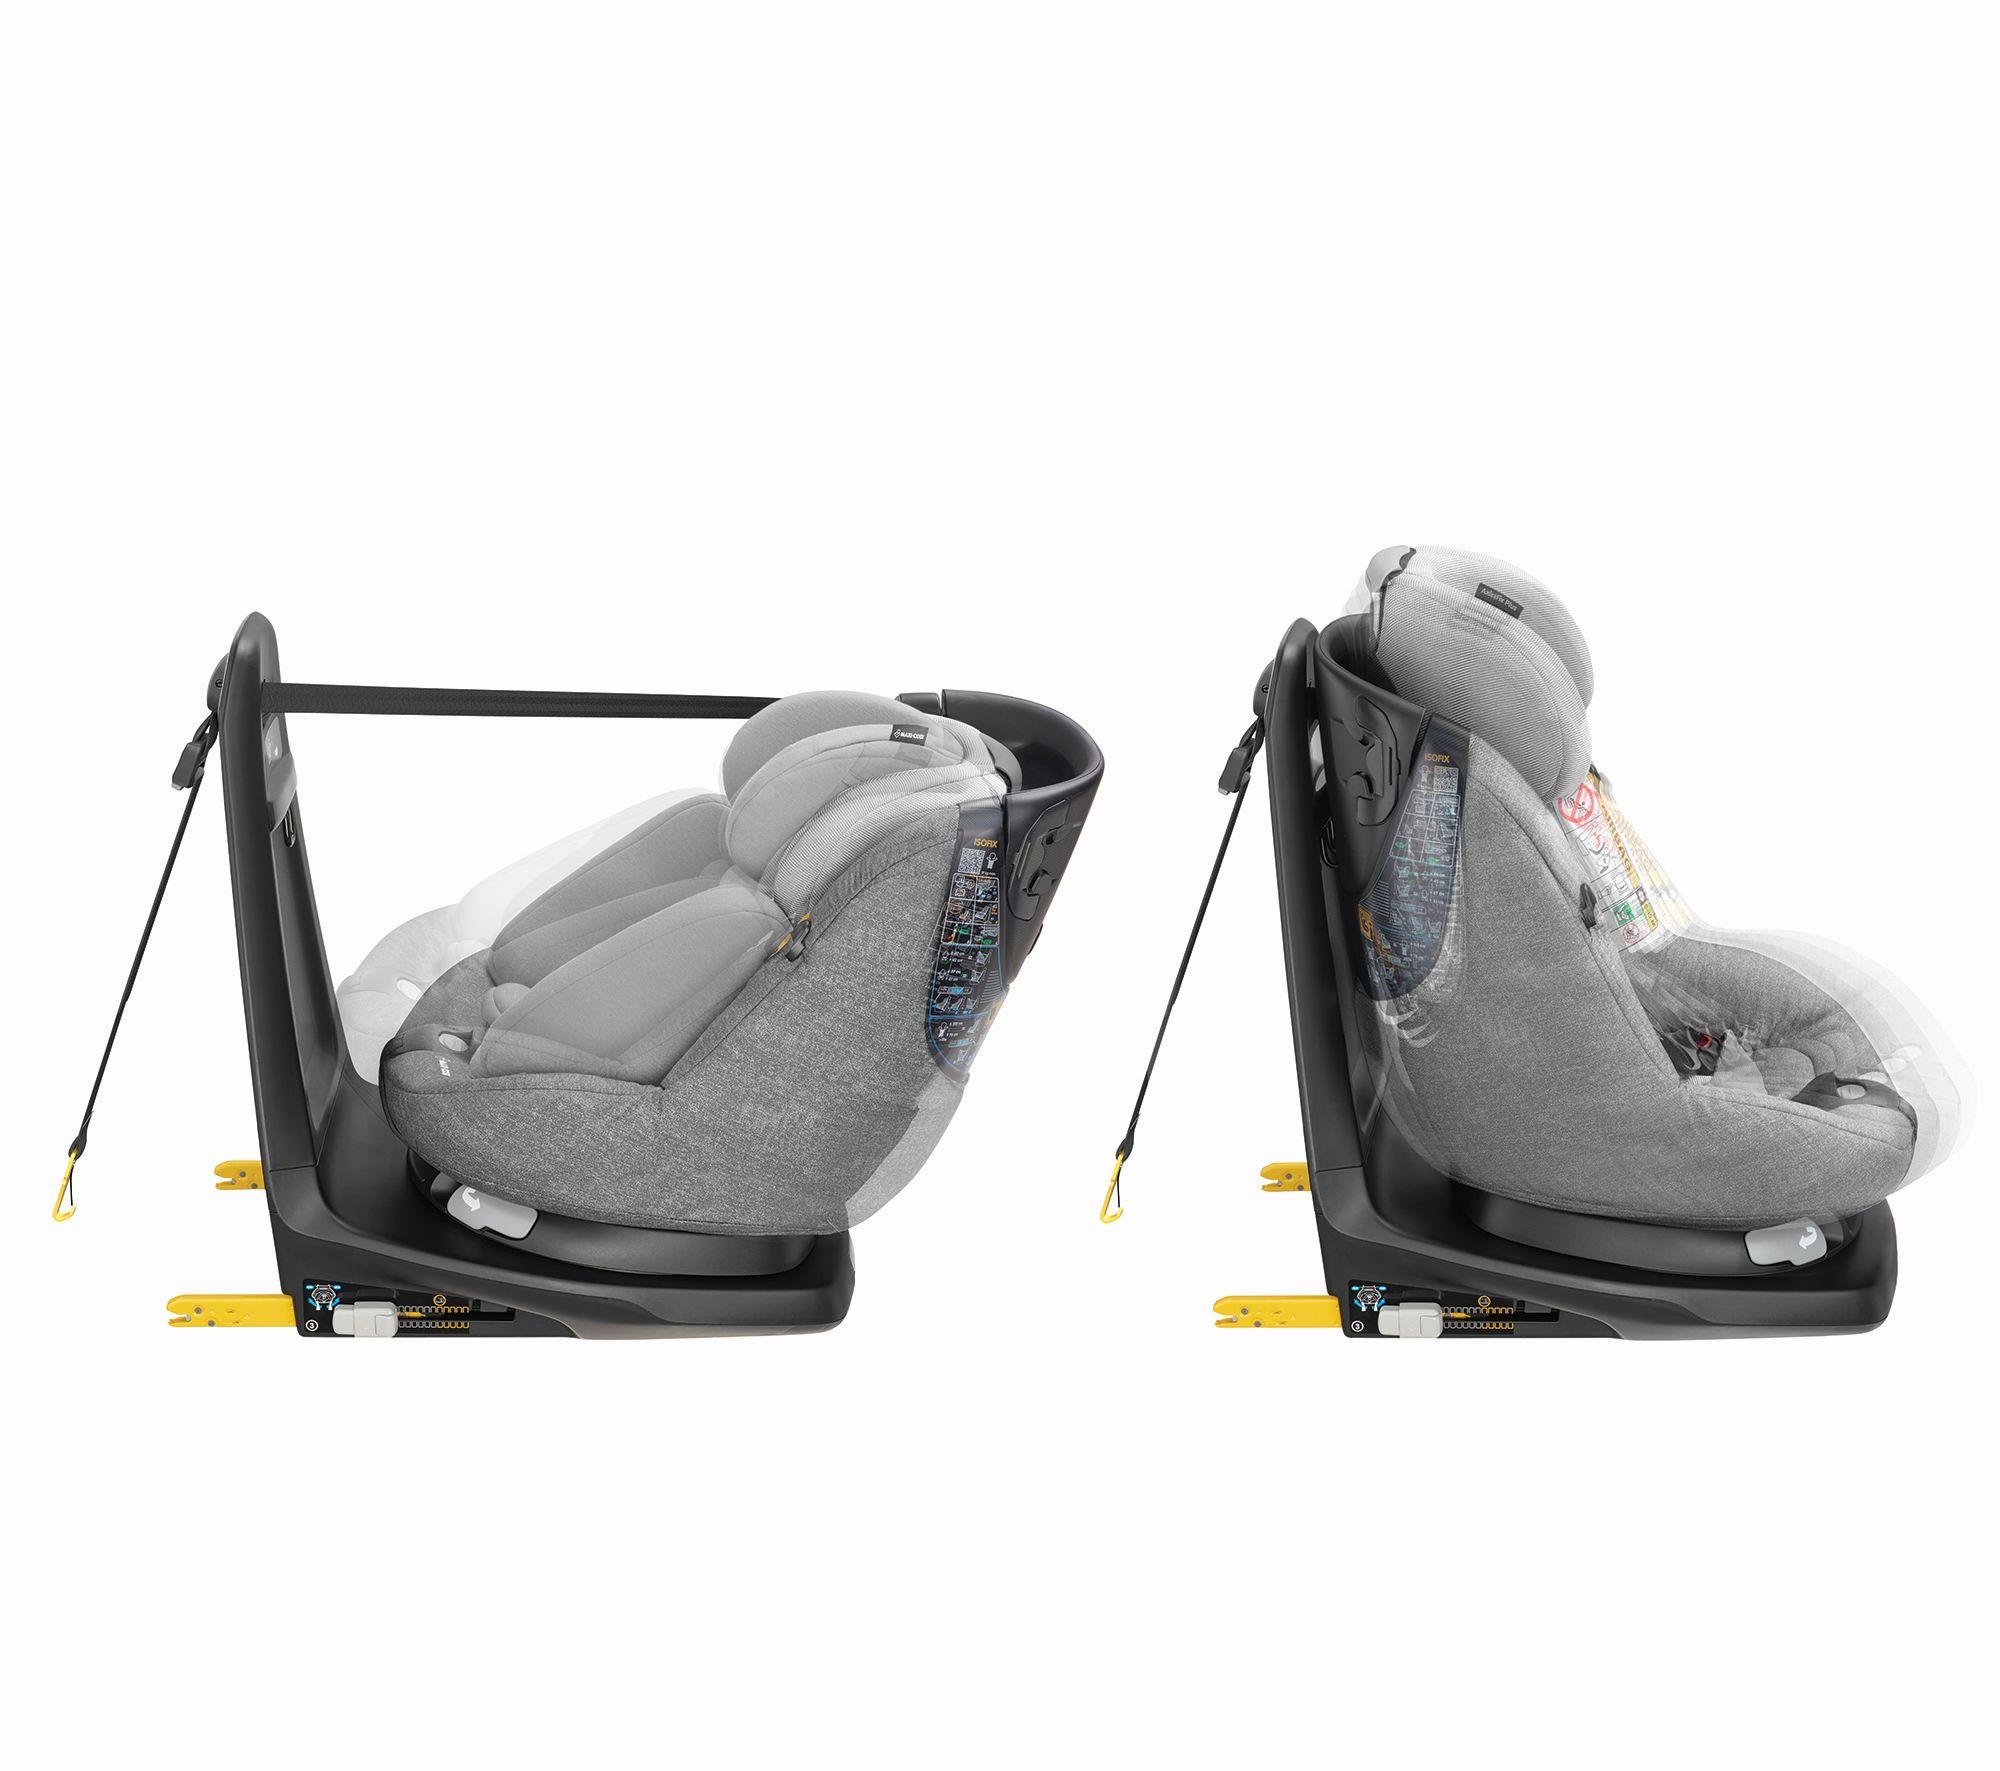 maxi cosi child car seat axissfix plus 2018 nomad grey buy at kidsroom car seats. Black Bedroom Furniture Sets. Home Design Ideas